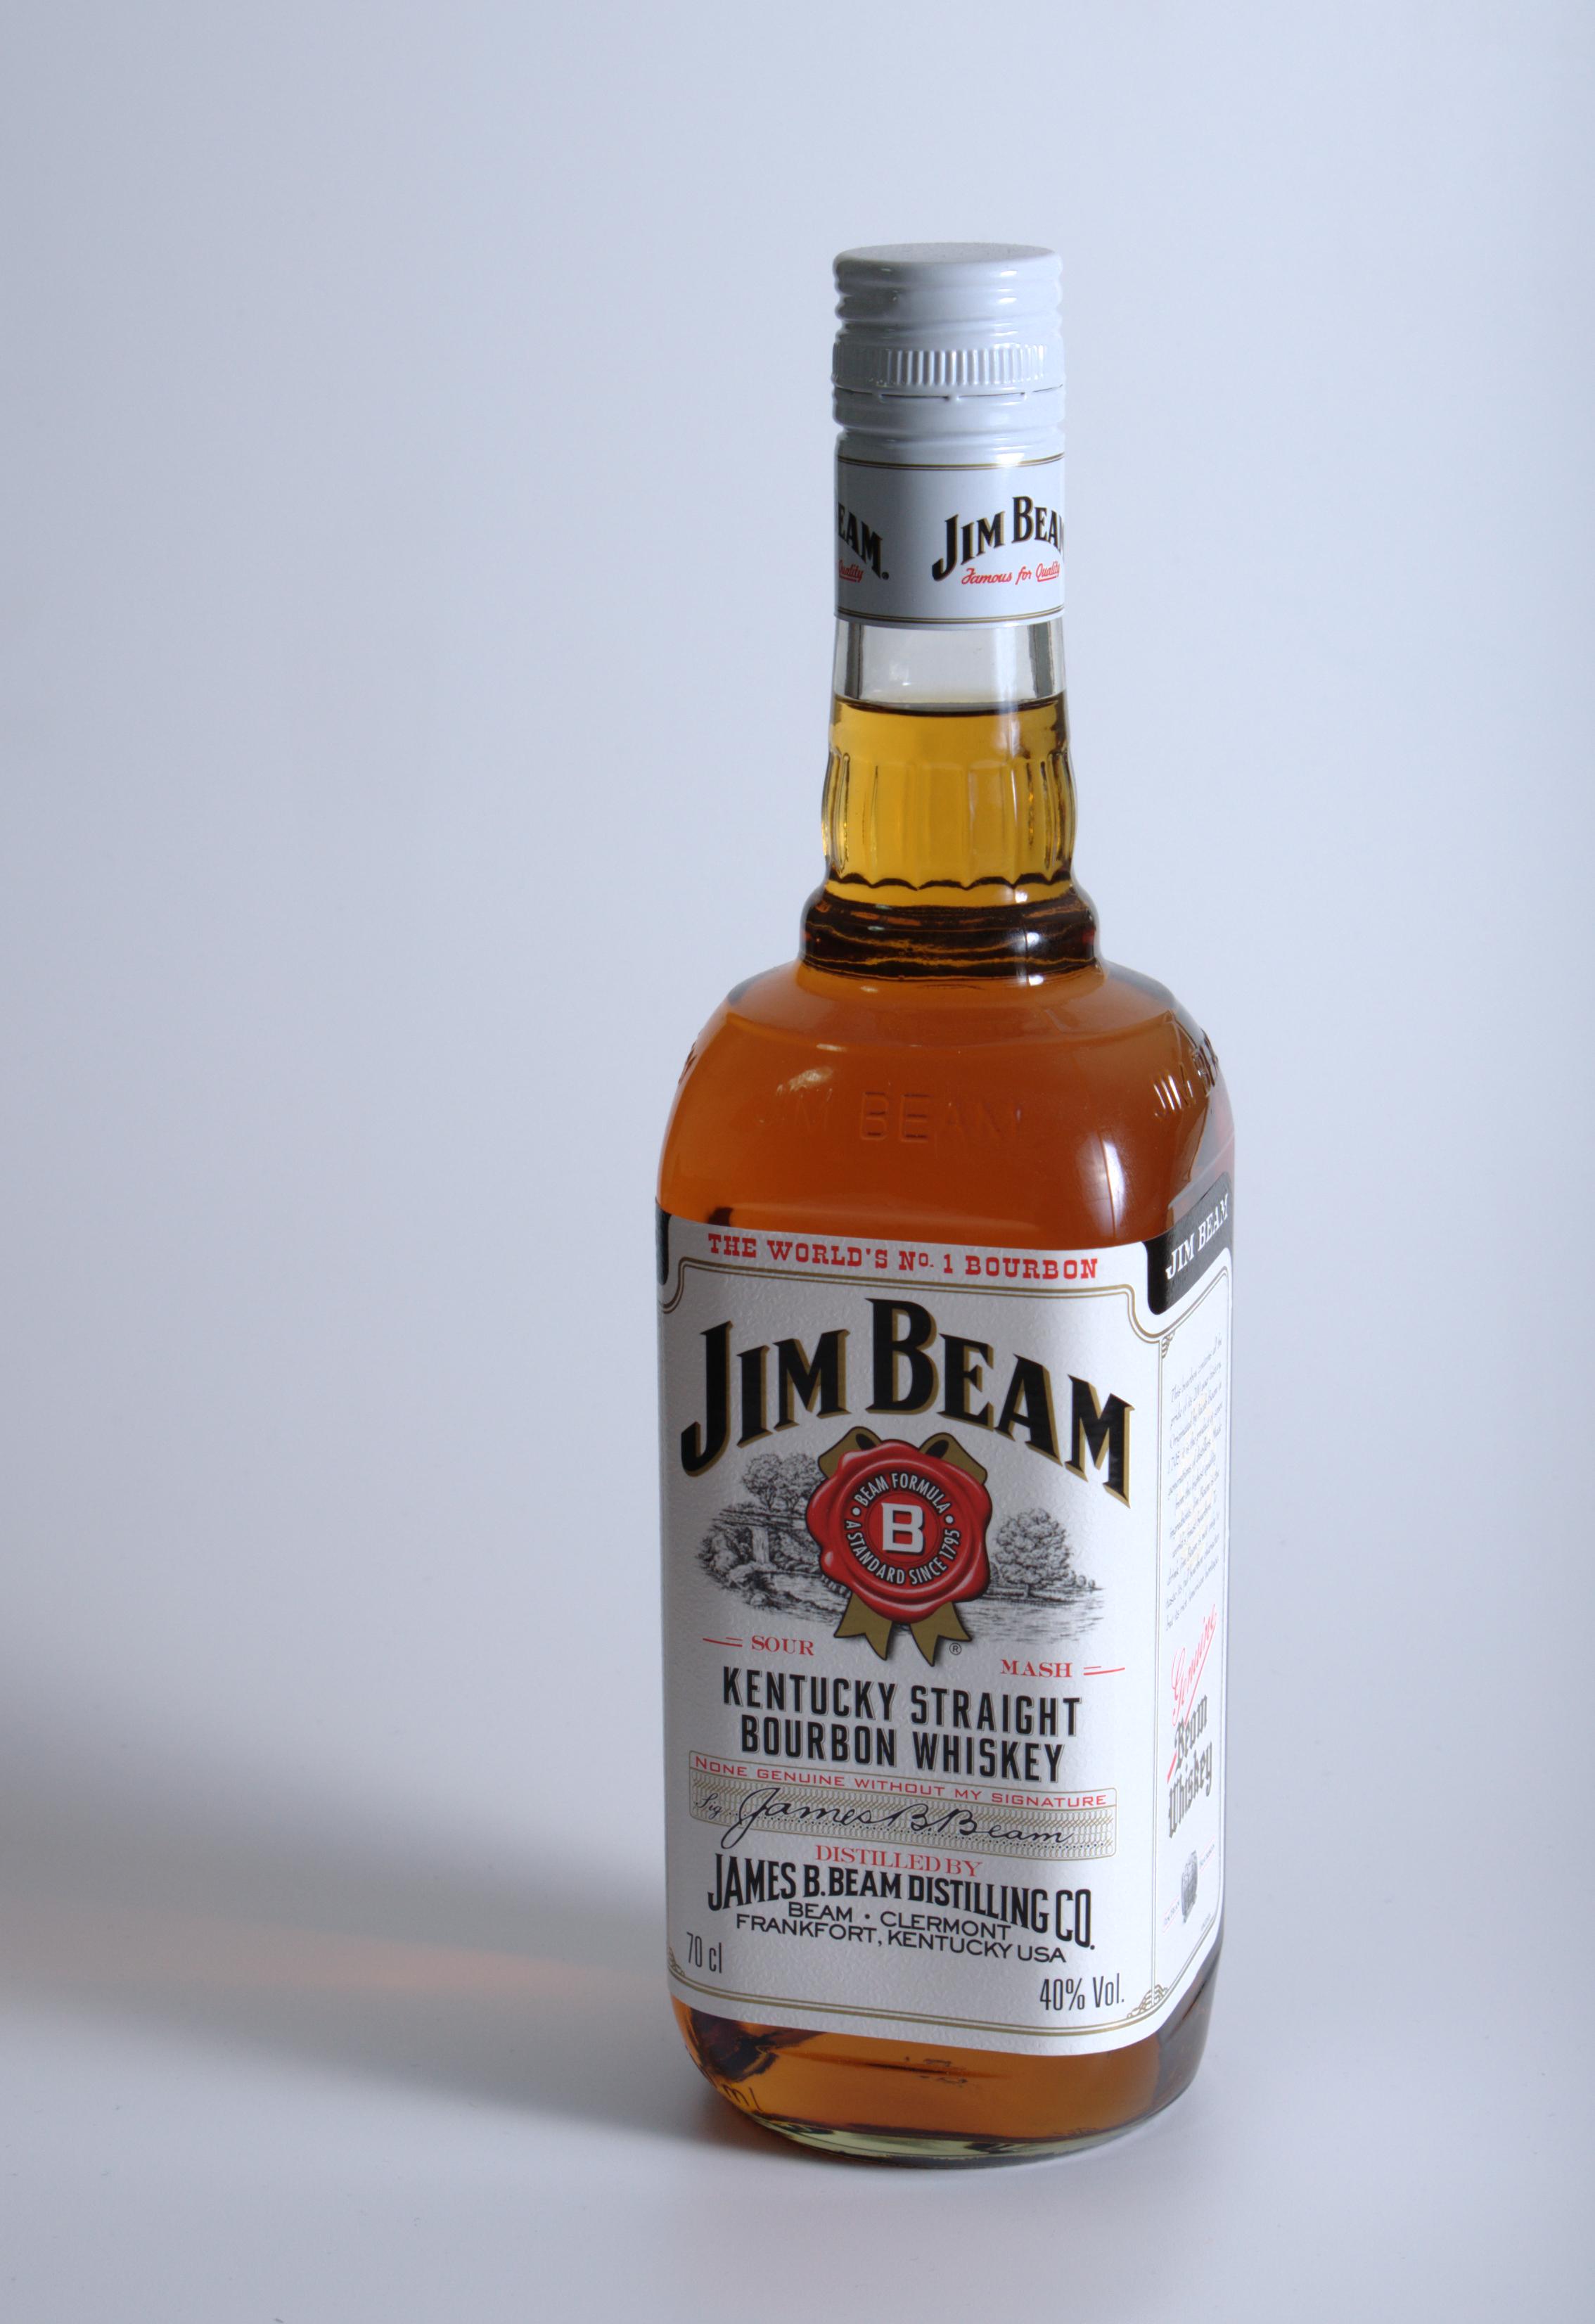 Whiskey Bottles And Brand New Cars Lyrics